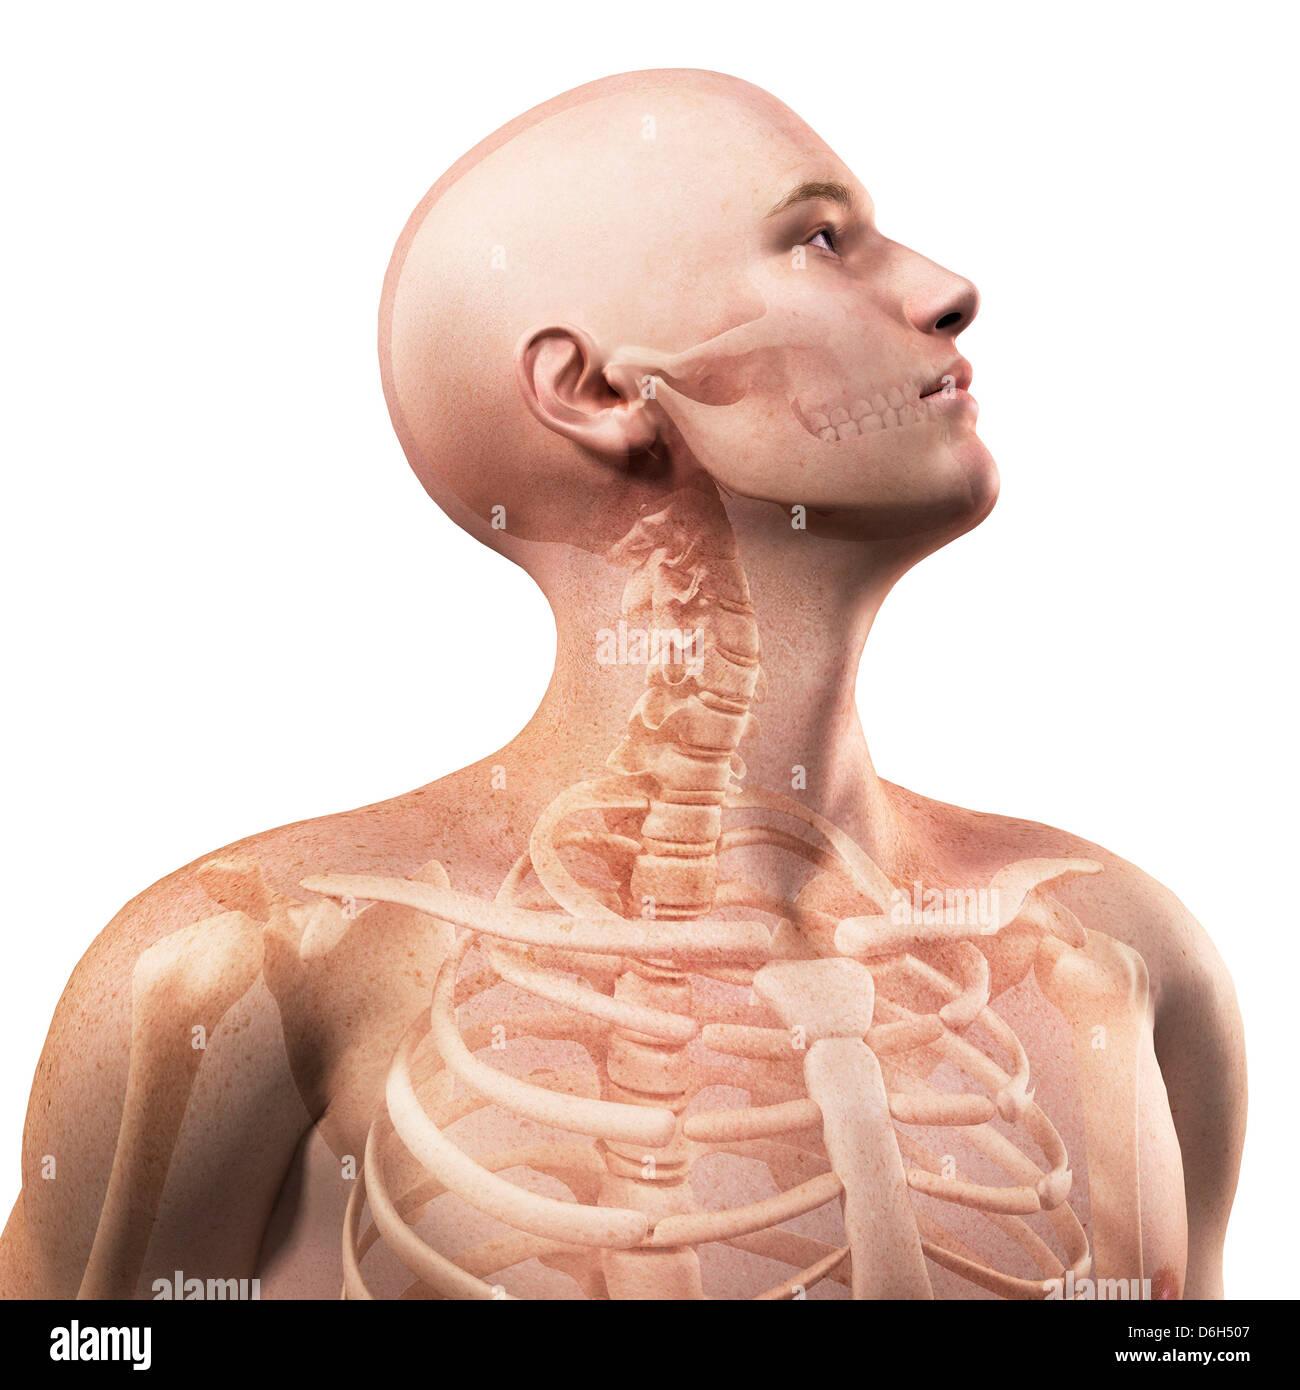 Oberkörper-Anatomie, artwork Stockfoto, Bild: 55696151 - Alamy